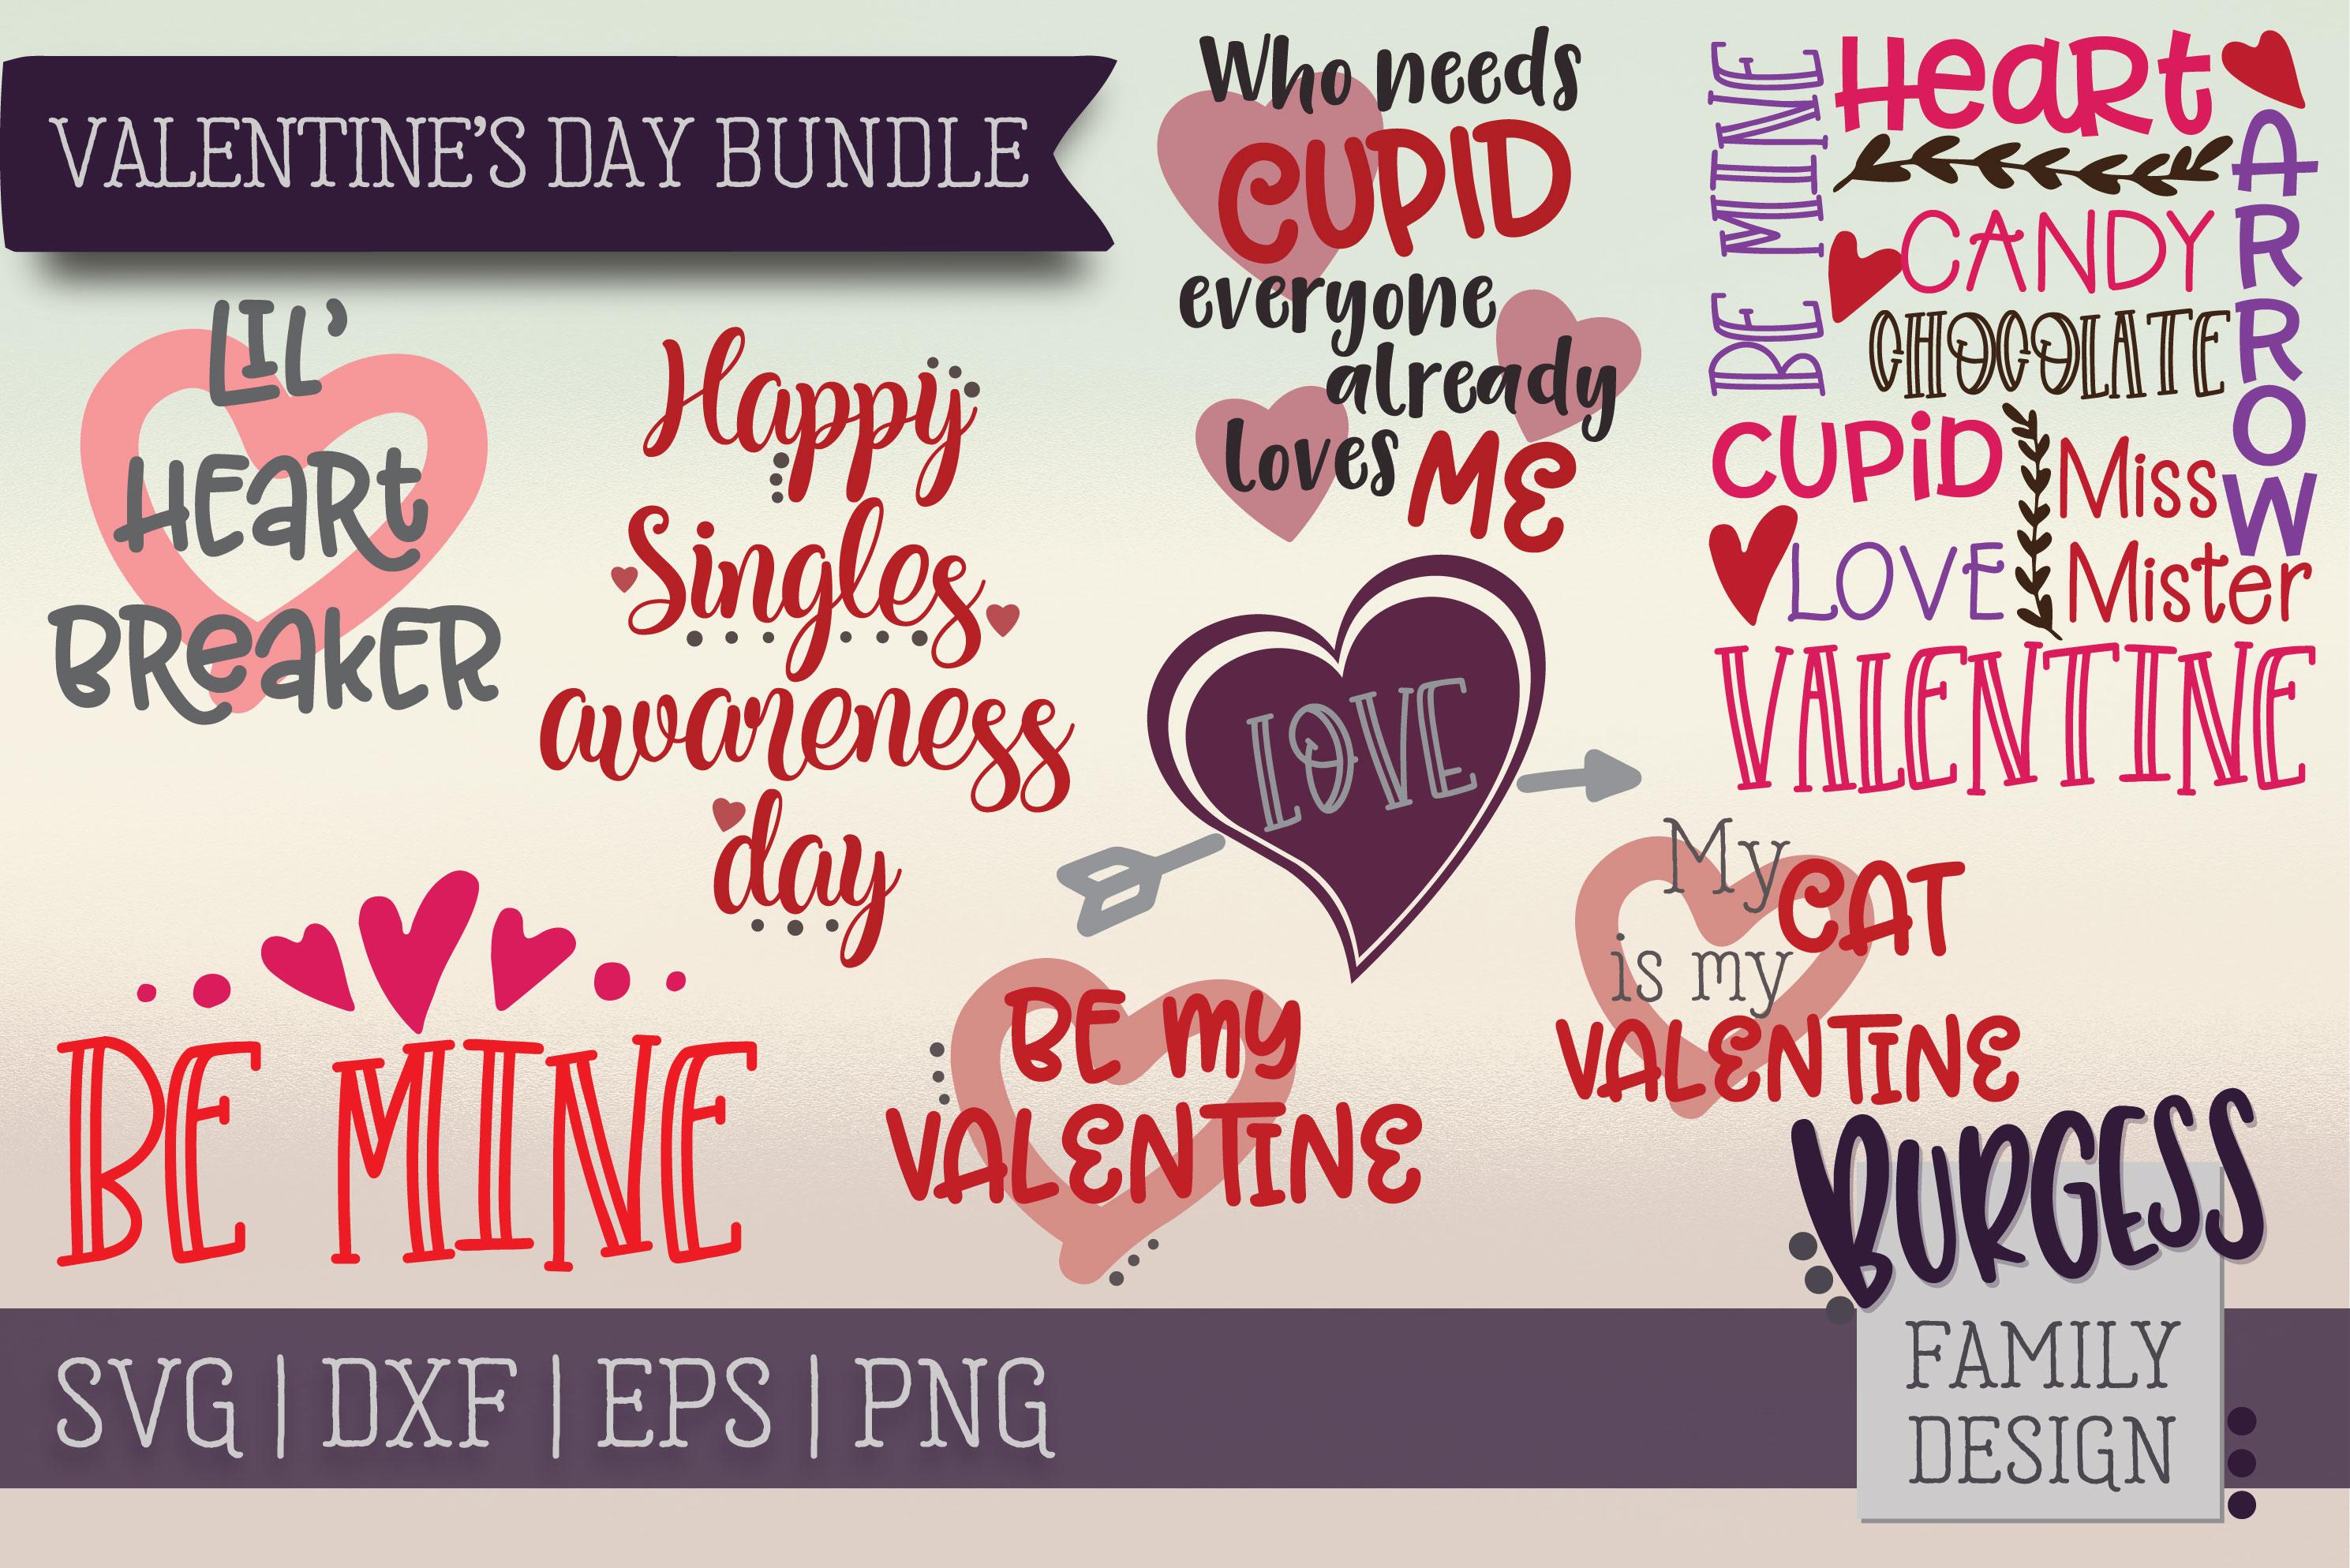 The starter bundle - Over 200 Designs | SVG DXF EPS PNG example image 10